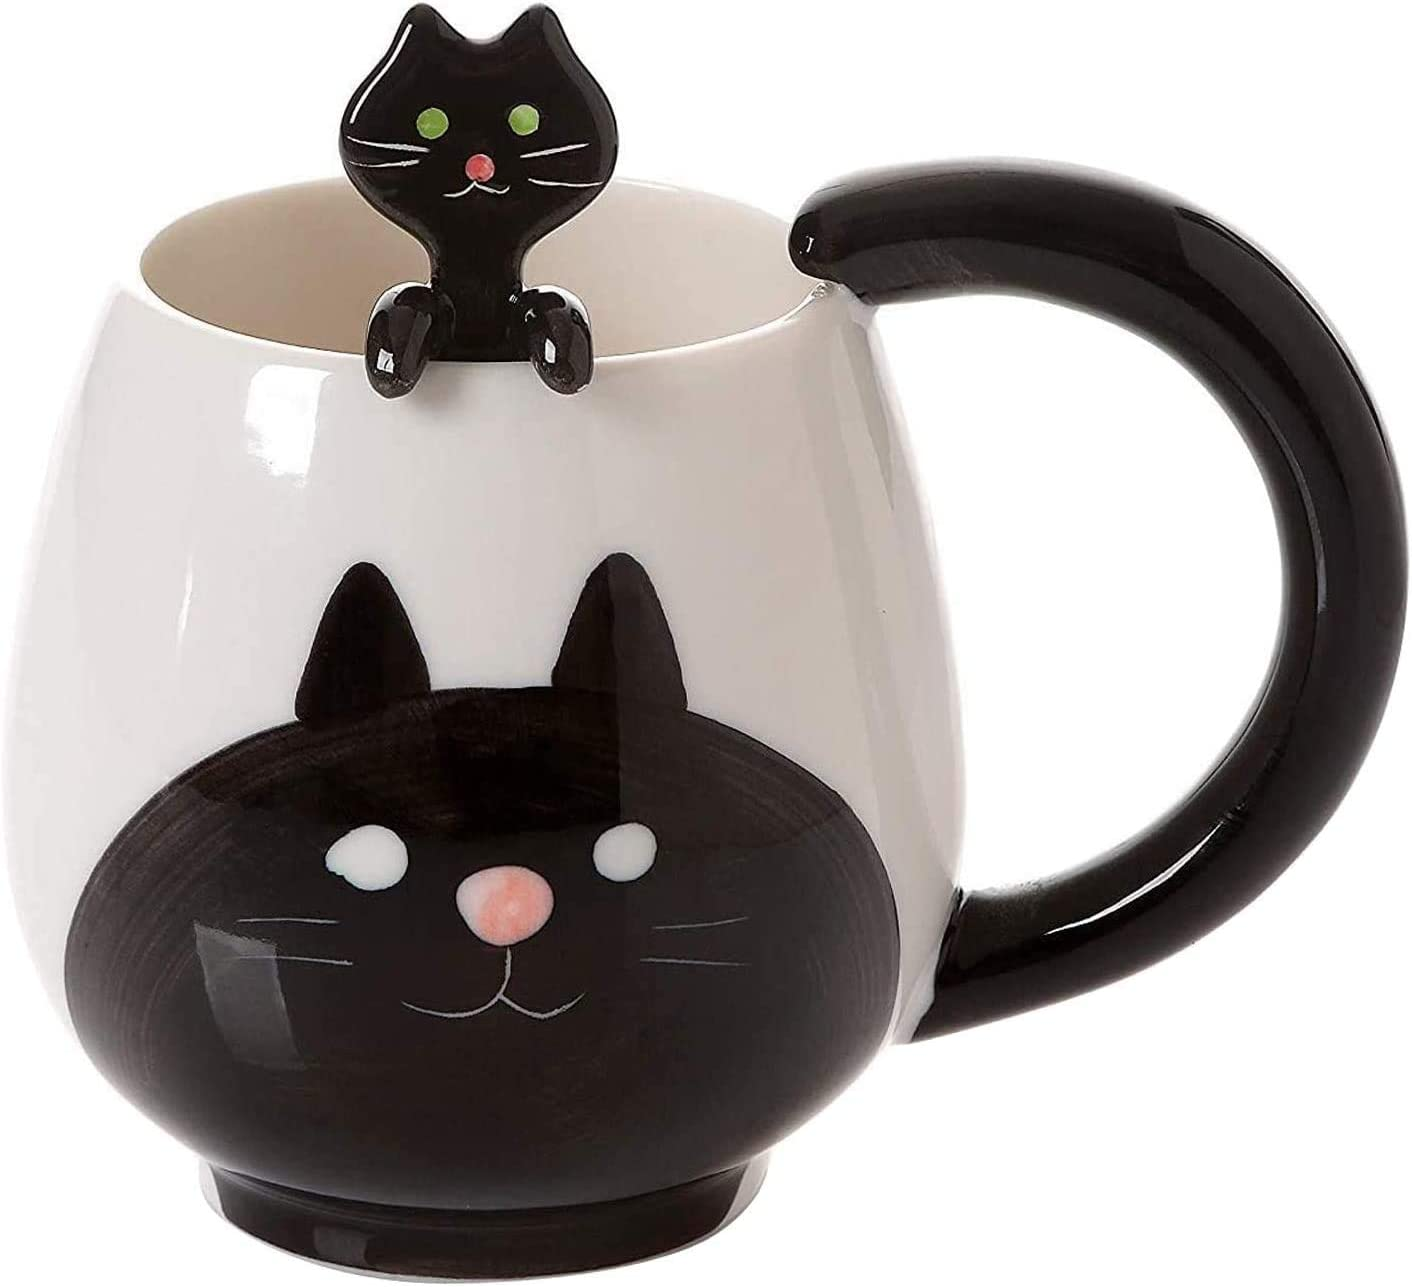 Funny Inexpensive Coffee Mug 15 oz Spoon Novel Sale SALE% OFF Pig with